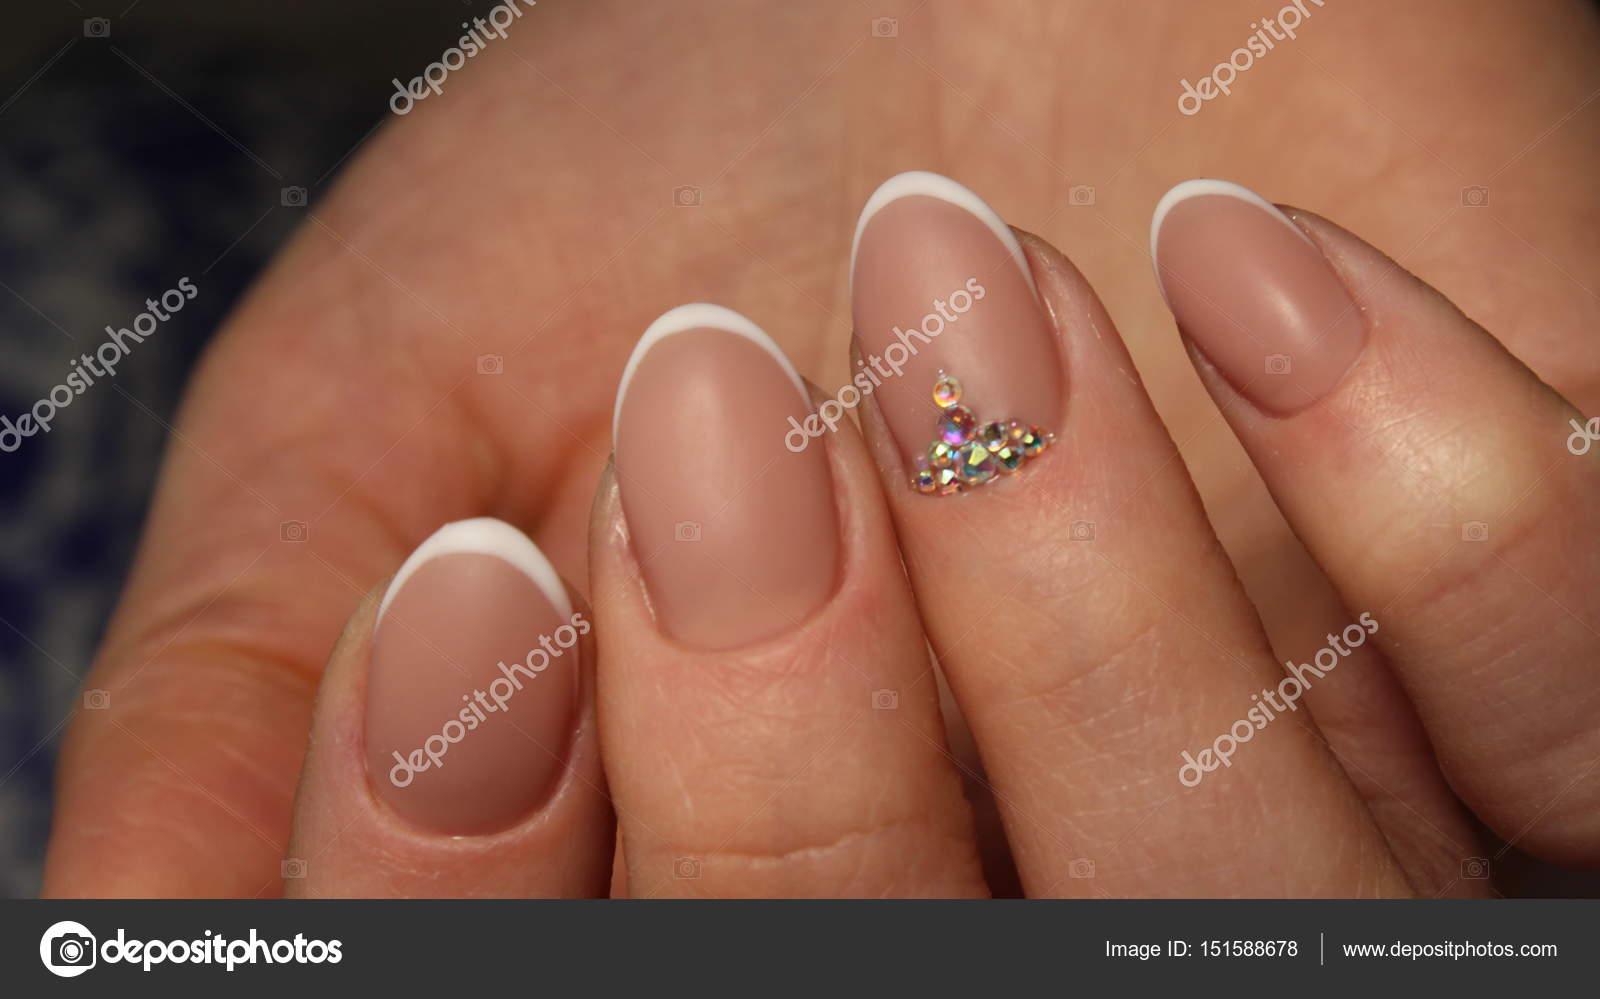 Wedding French manicure design — Stock Photo © SmirMaxStock #151588678